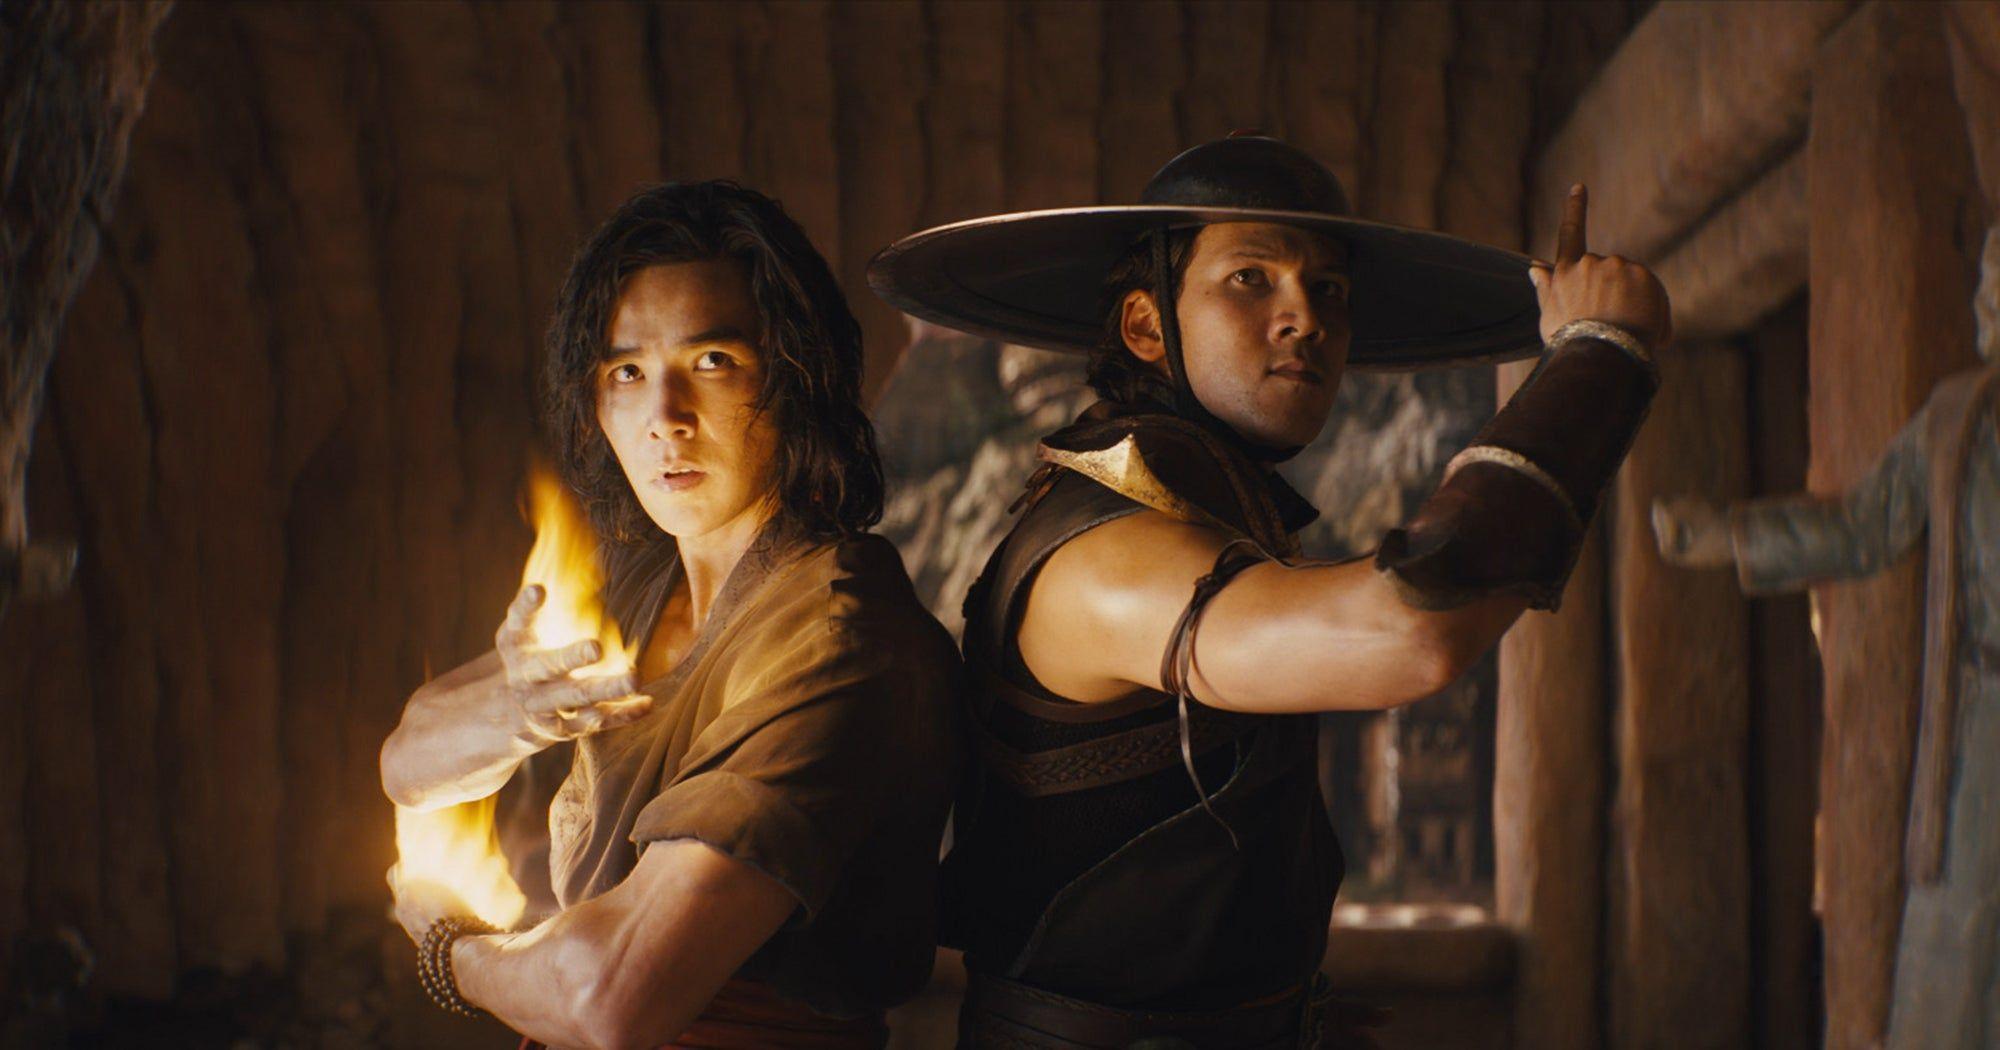 The Mortal Kombat Cast Has A Super Power Pure Unadulterated Thirst In 2021 Mortal Kombat Liu Kang Free Movies Online